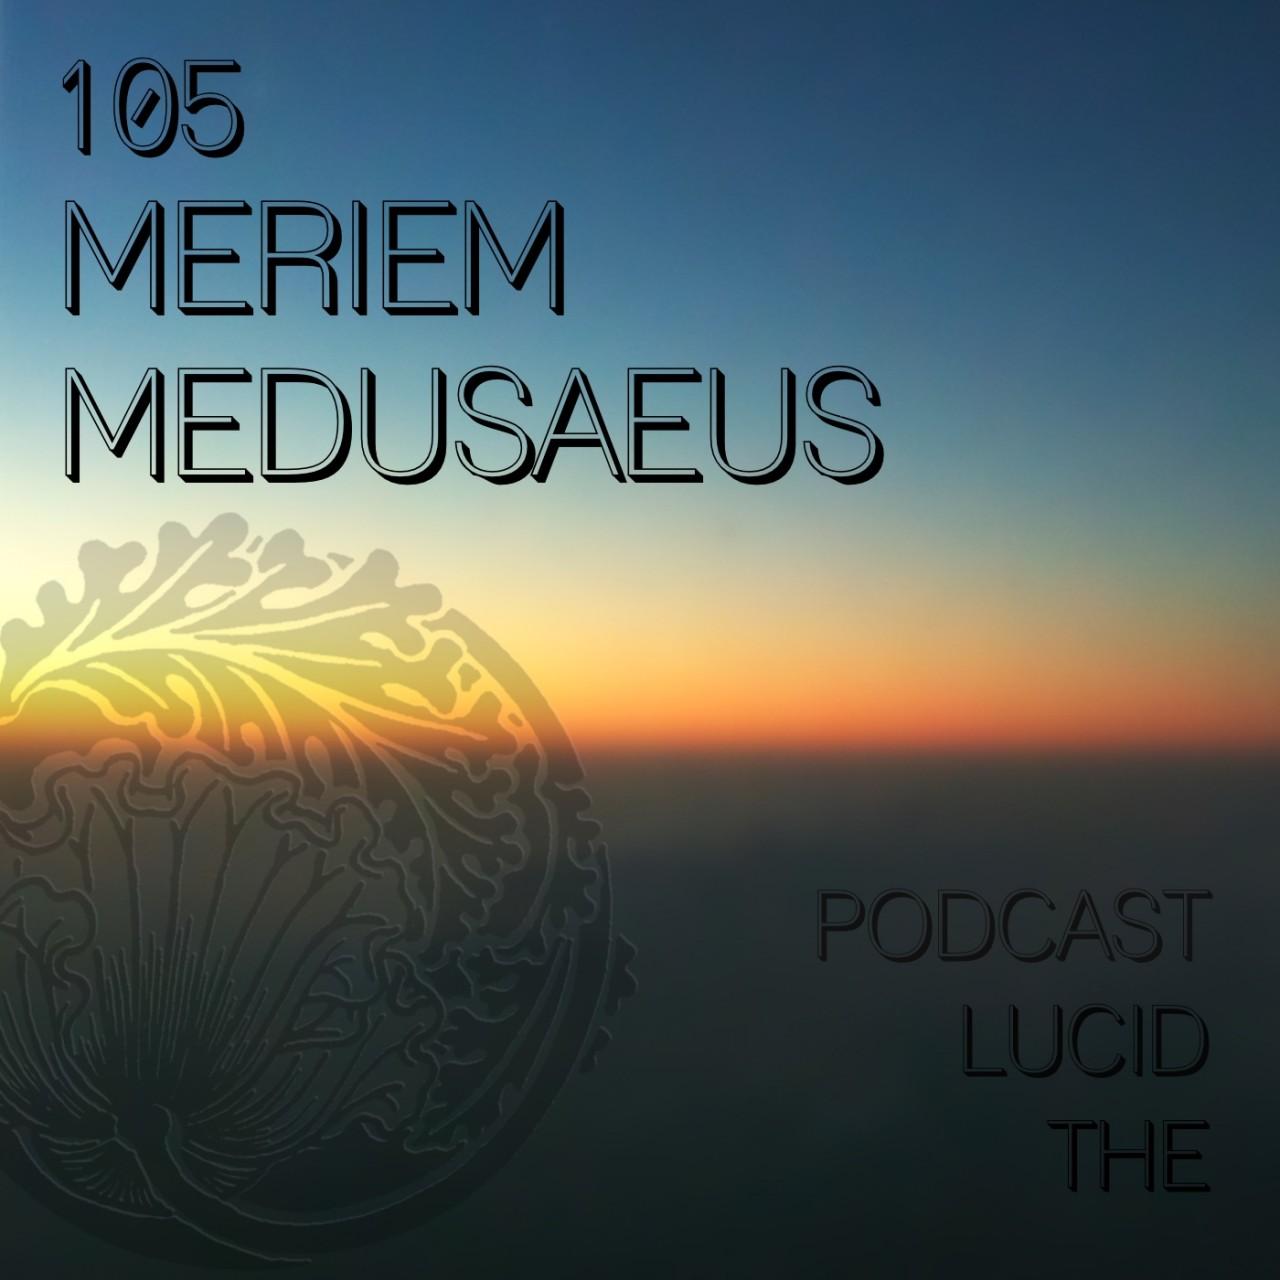 The Lucid Podcast 105 Meriem Medusaeus